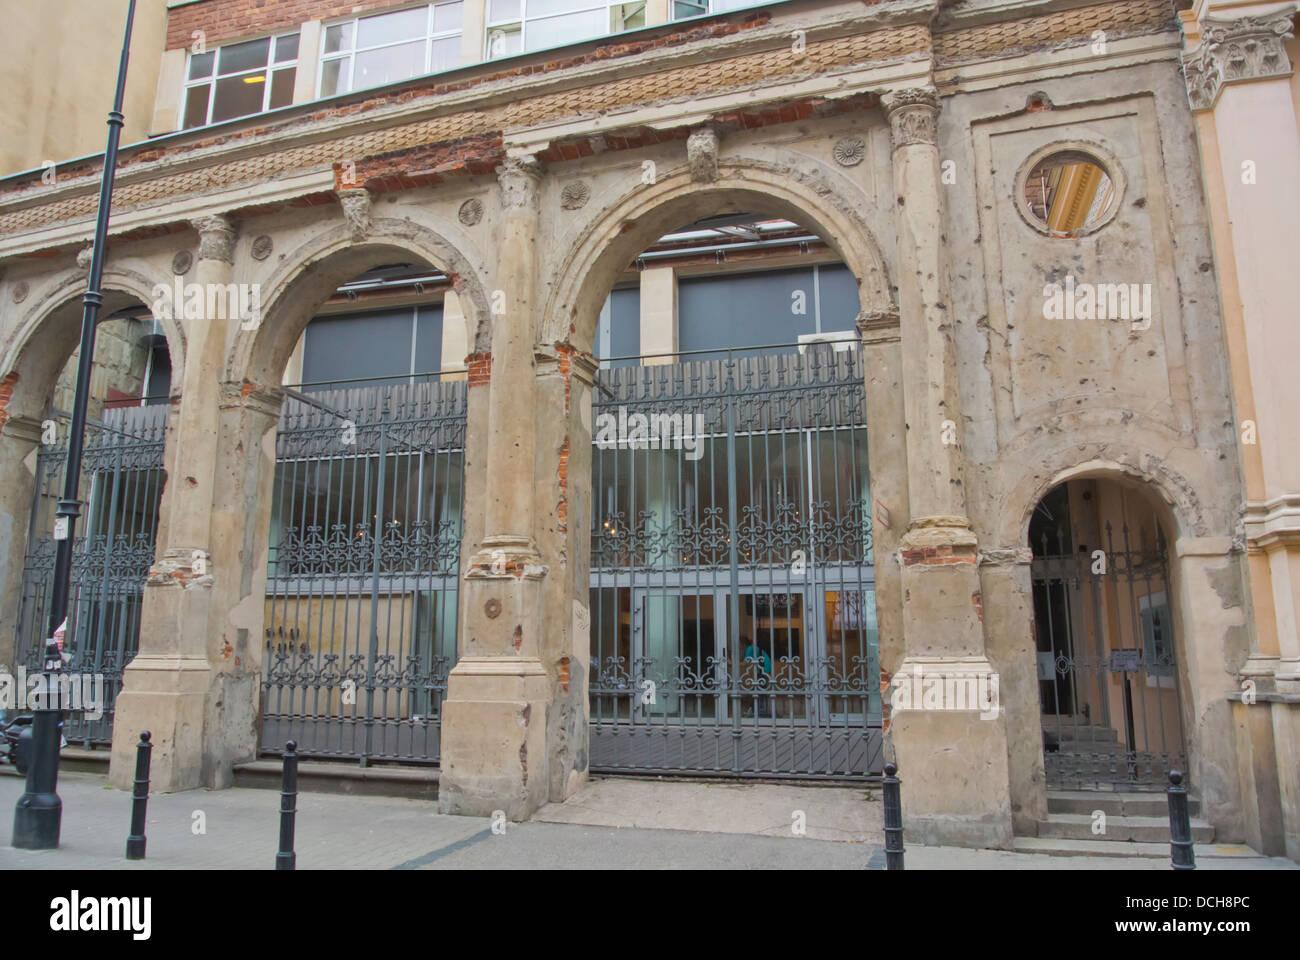 Ehemalige Landesbank Gesellschaft Gebäude Fassade Mazowiecka Straße Warschau Polen Europa Stockbild